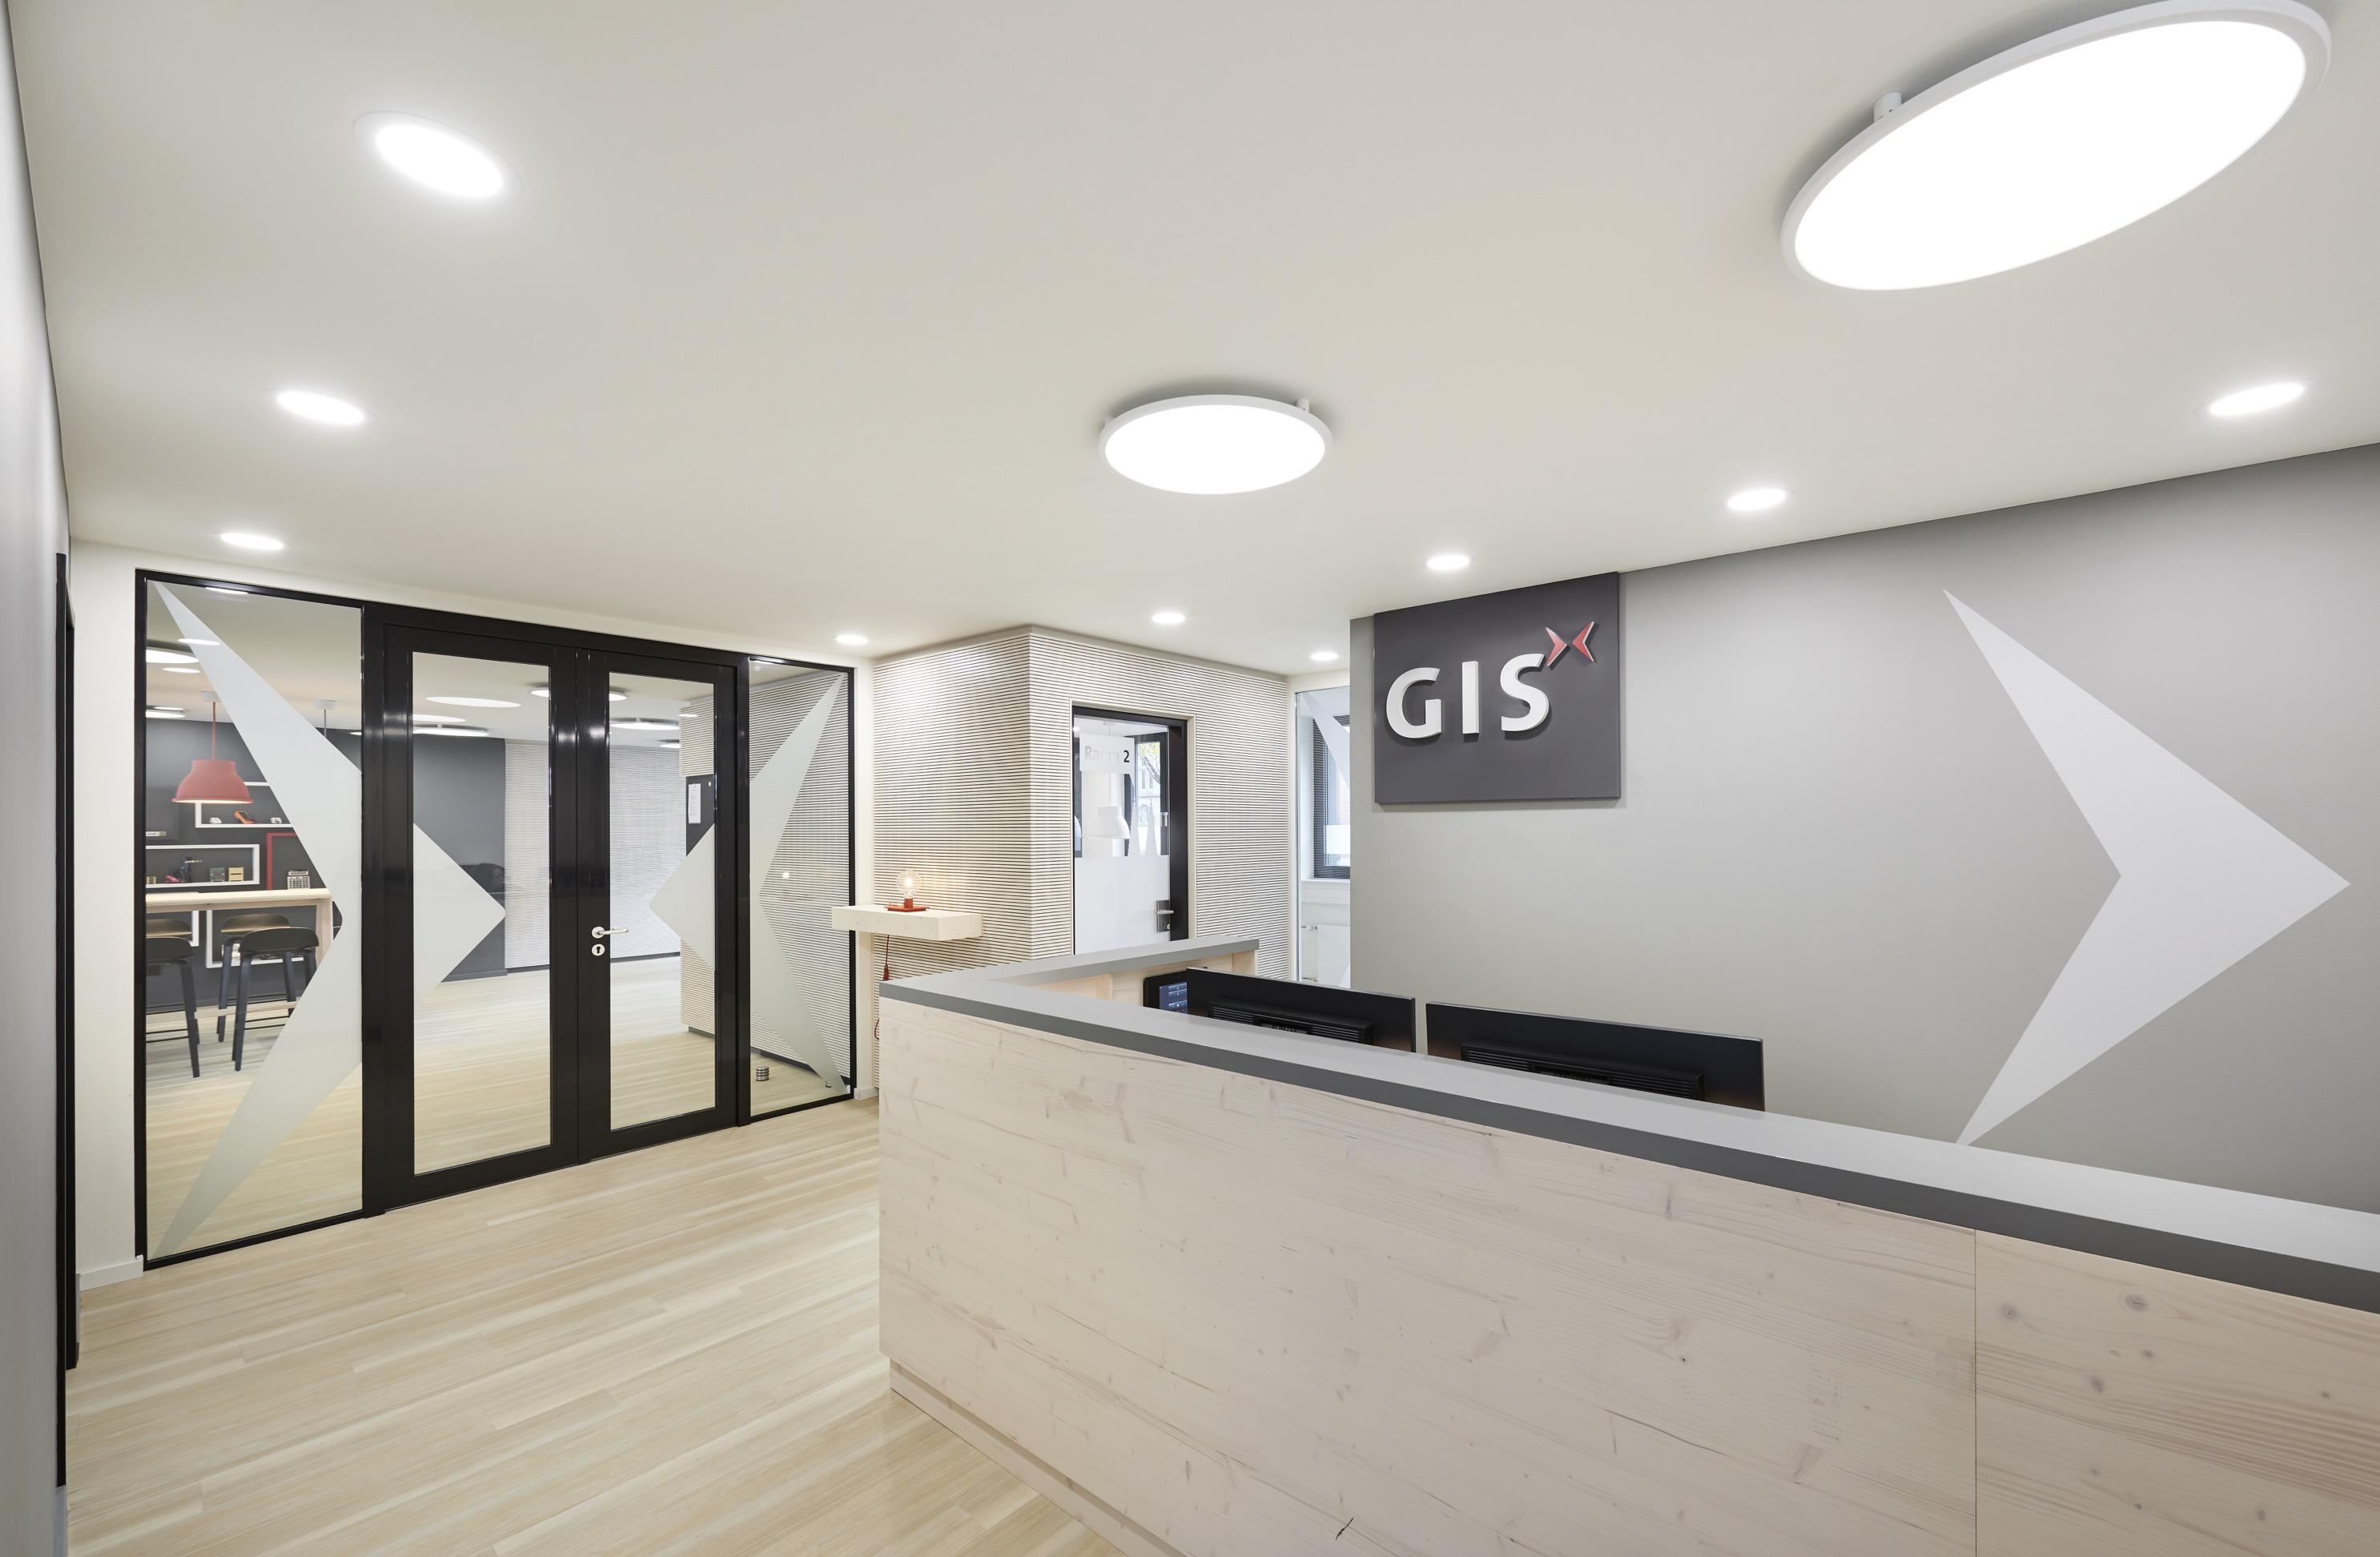 GIS-Koeln-Interior